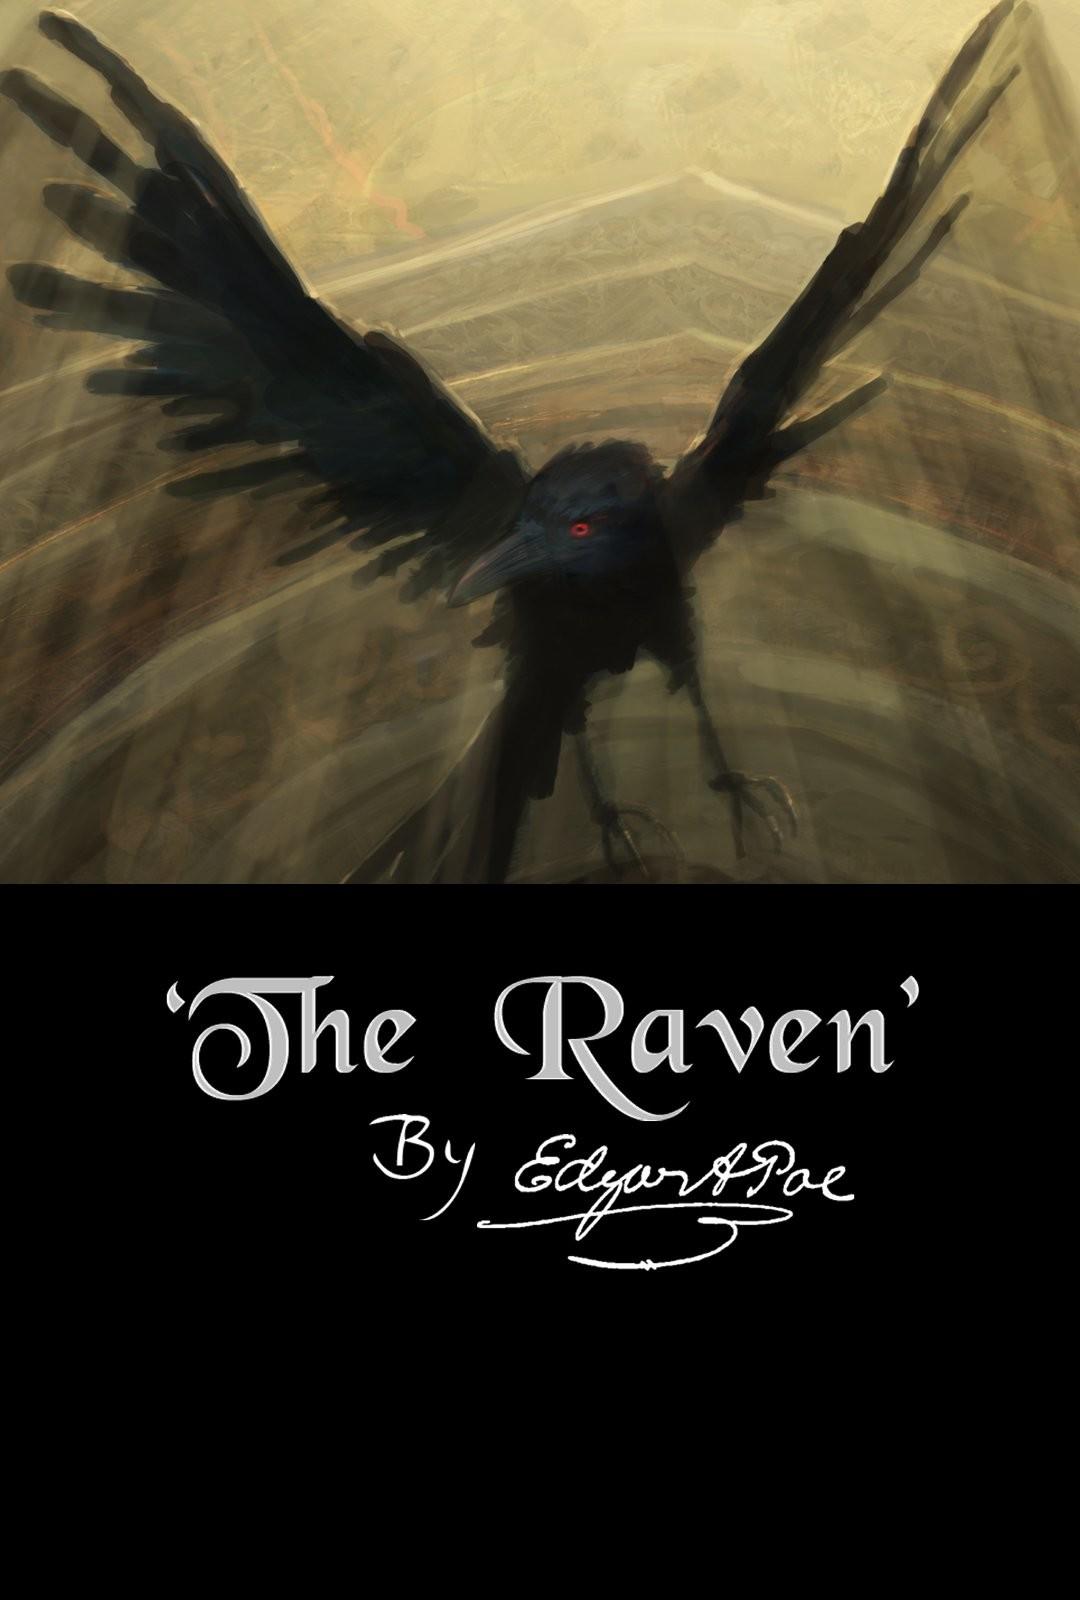 Watch The Raven By Edgar Allan Poe Free Online